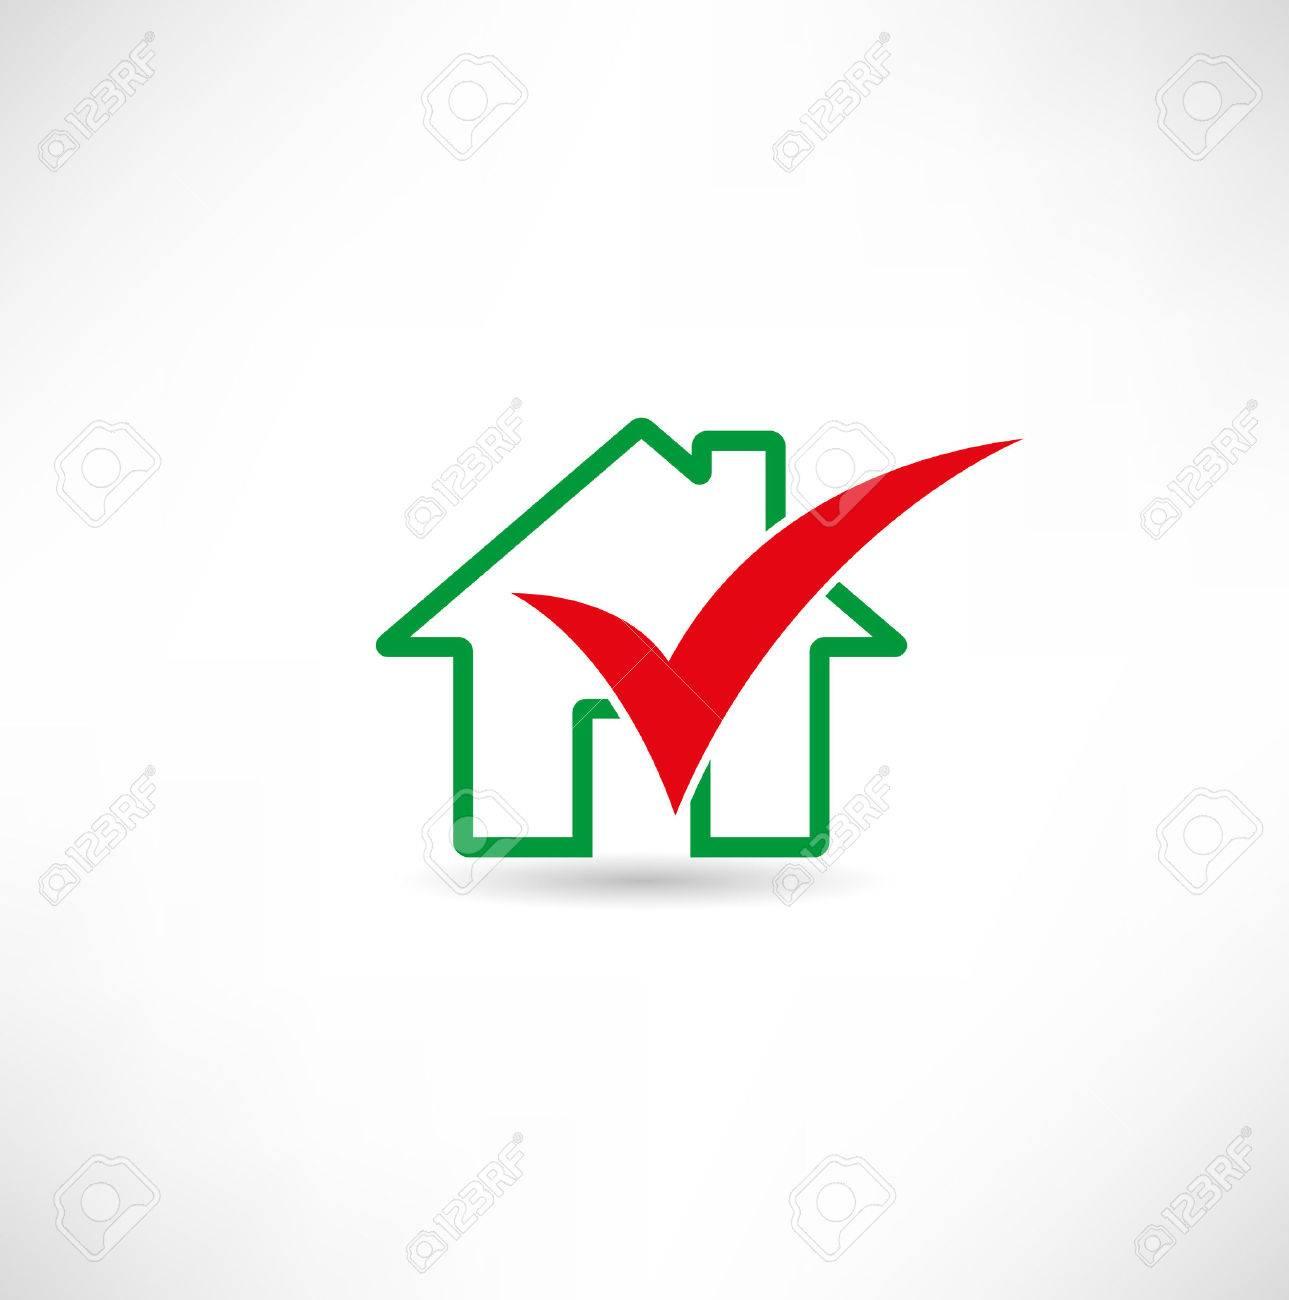 Home and checkbox Standard-Bild - 23060205